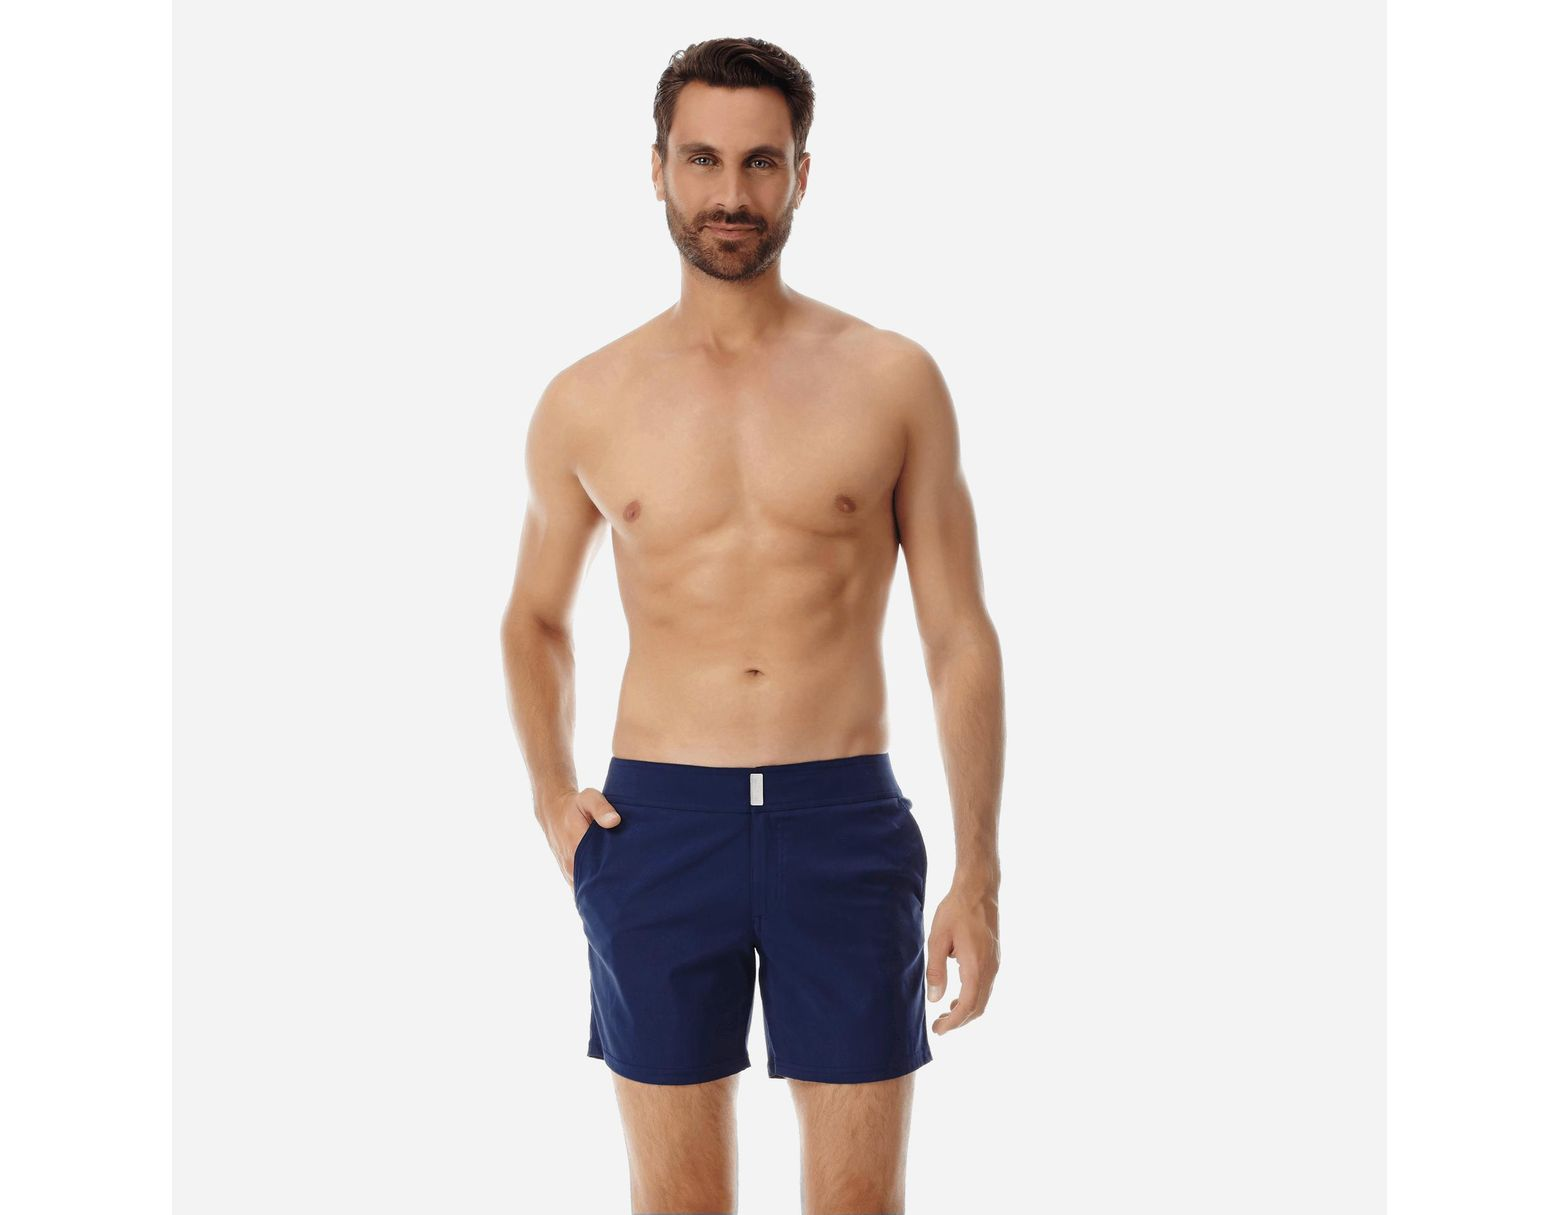 294880c16e Vilebrequin Men Flat Belt Stretch Swimwear Solid in Blue for Men - Lyst